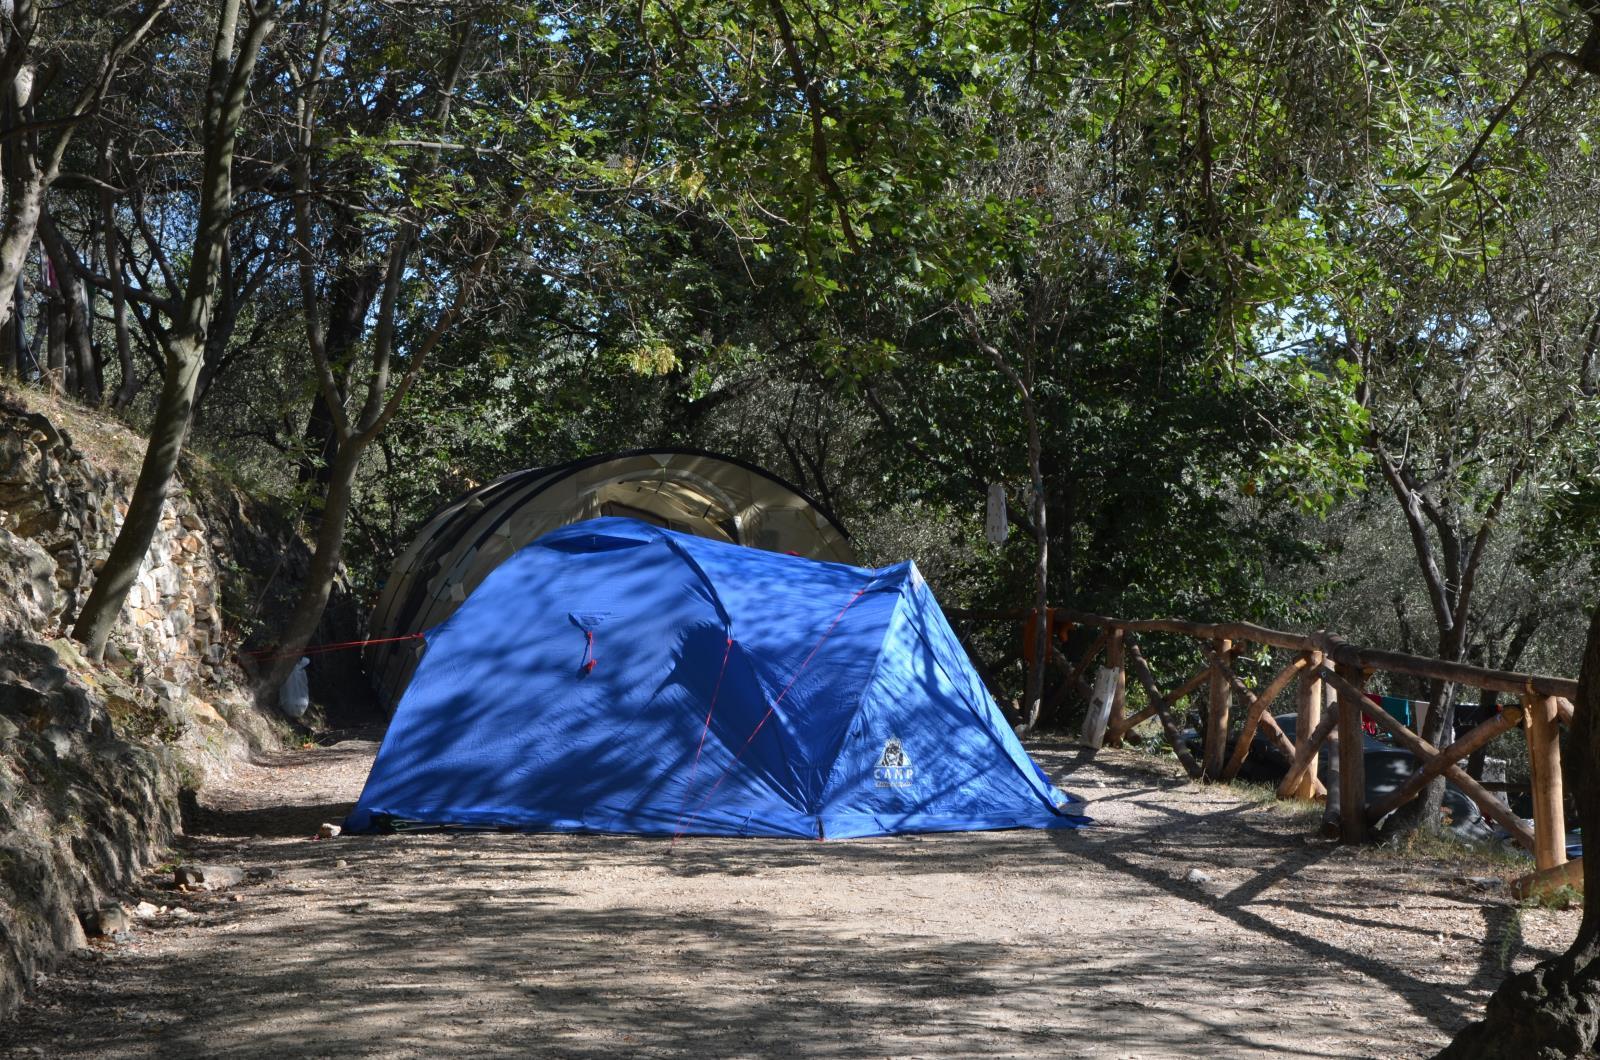 Emplacement - Demi Emplacement (Tente Canadienne) - Max 3 X 3 M. - Camping Pian dei Boschi